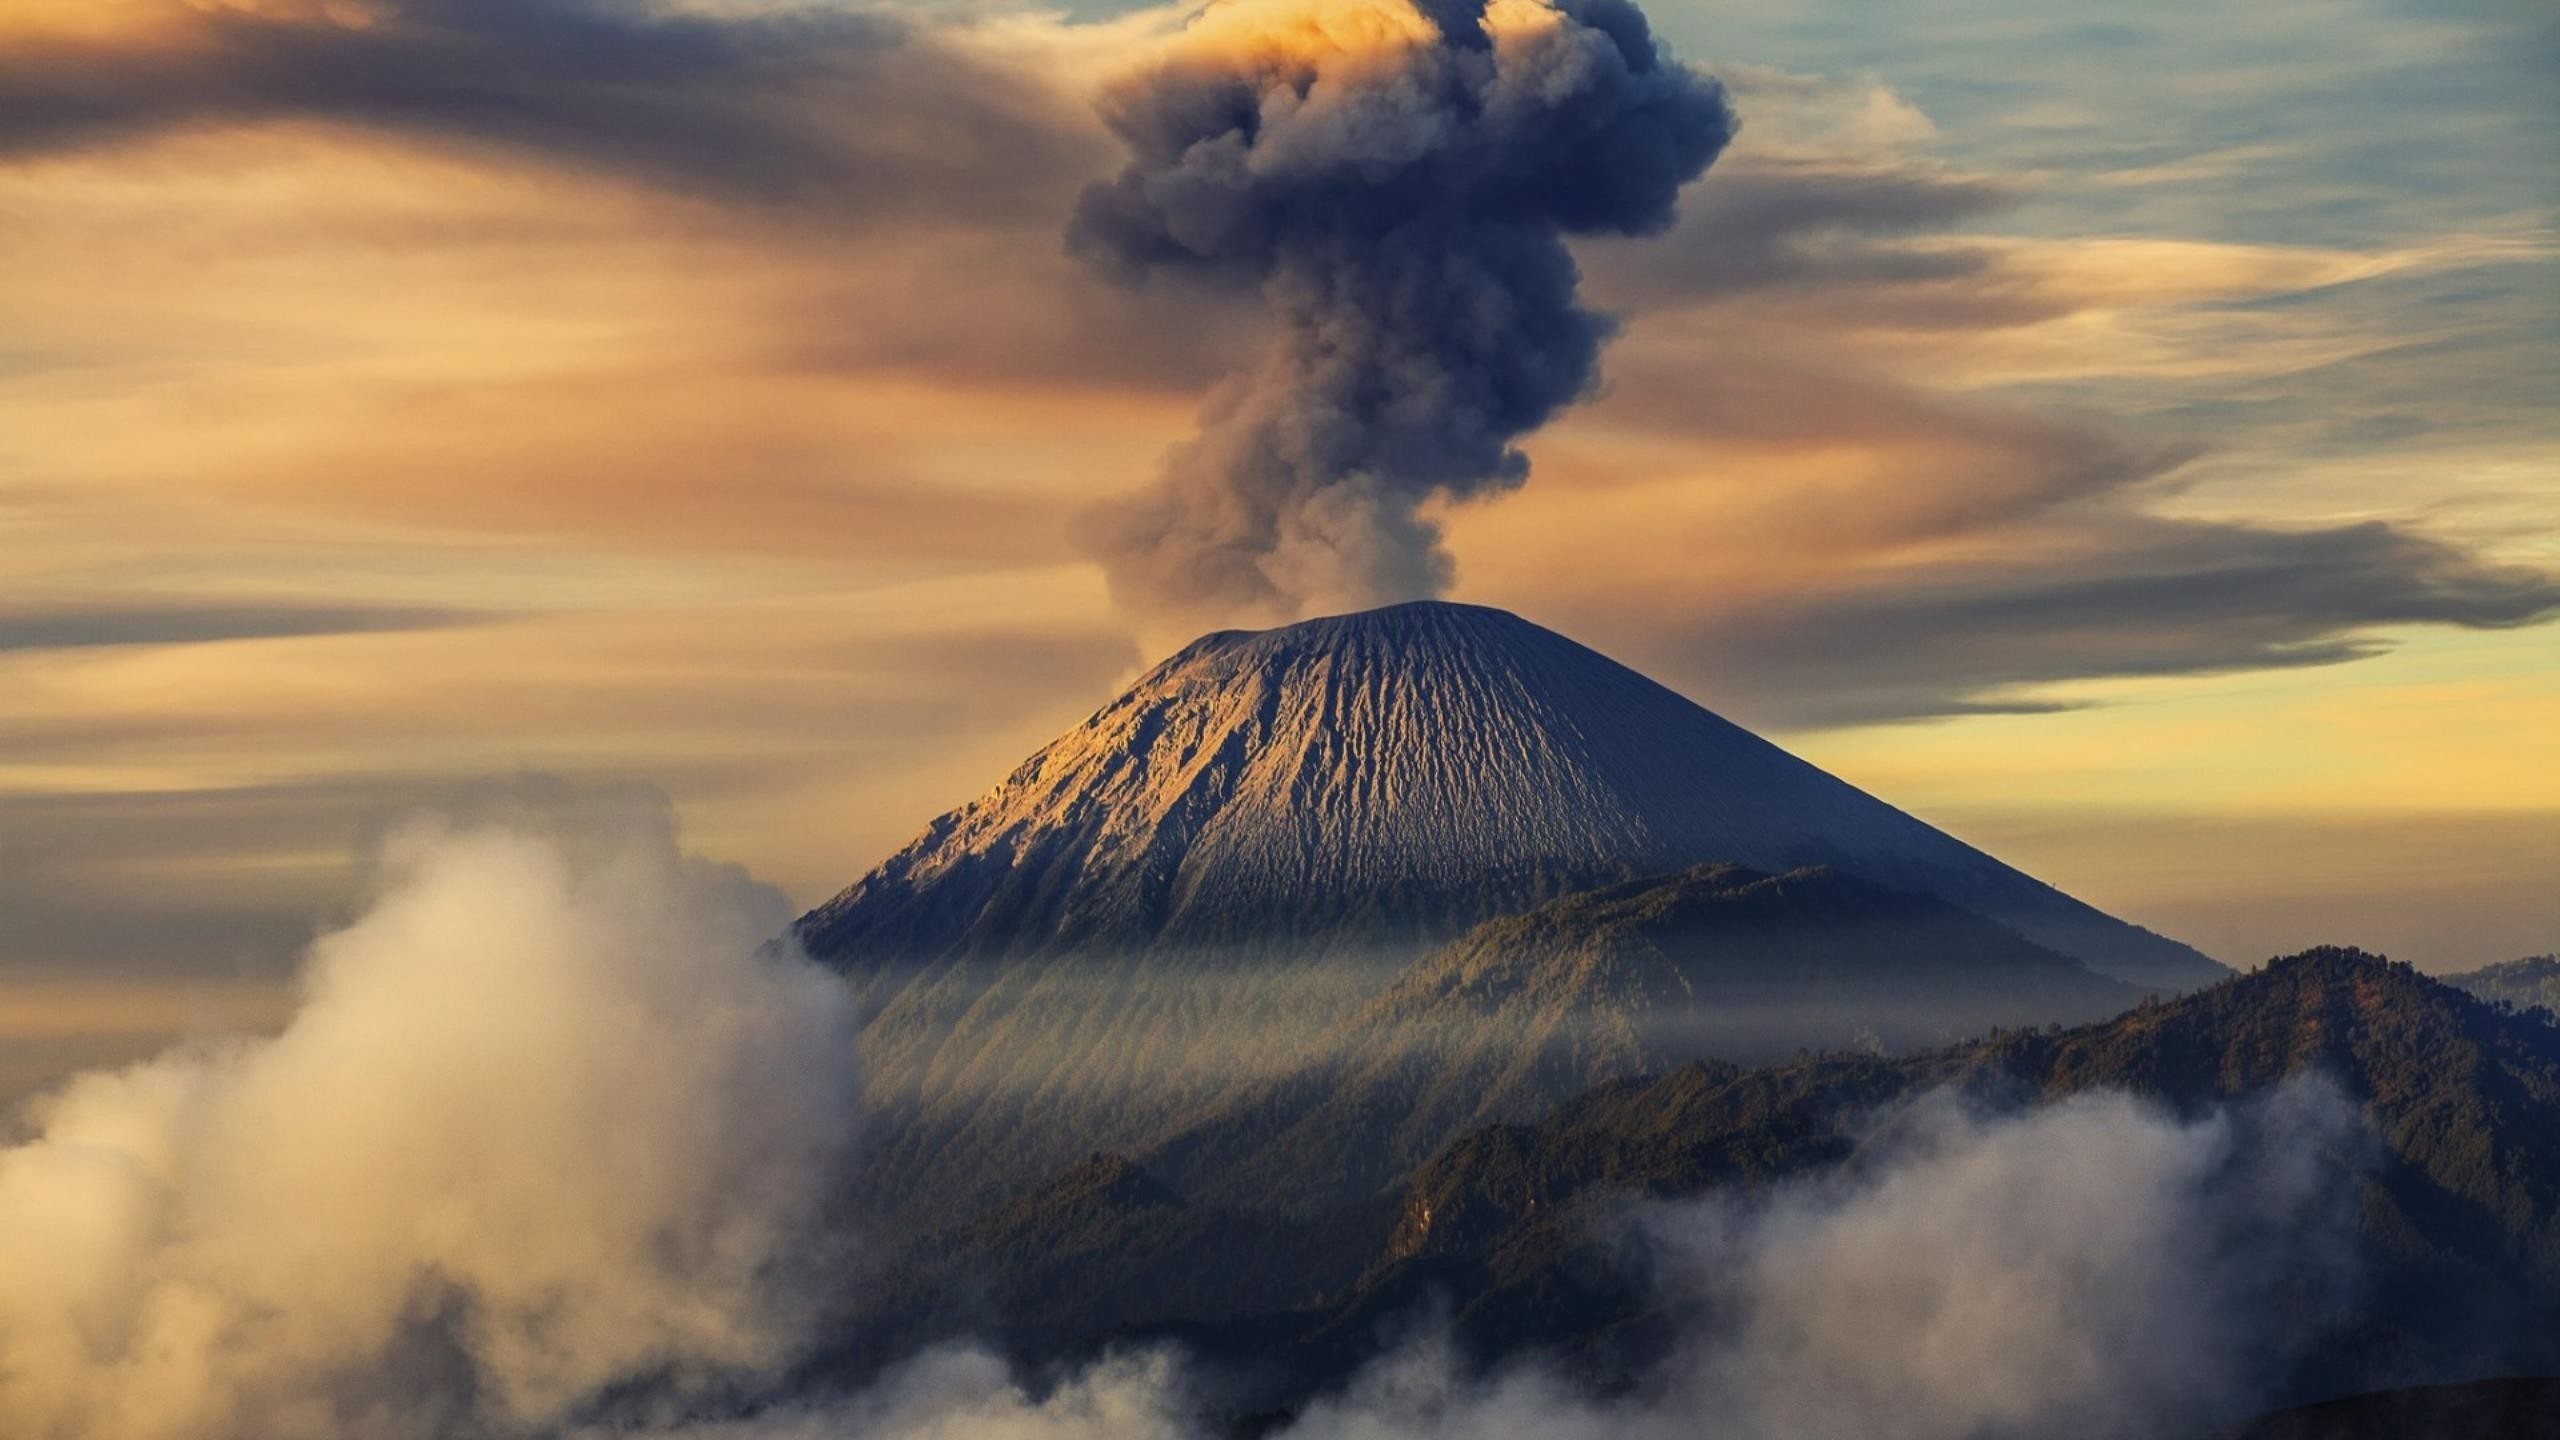 Volcano HD Background Wallpaper 09753